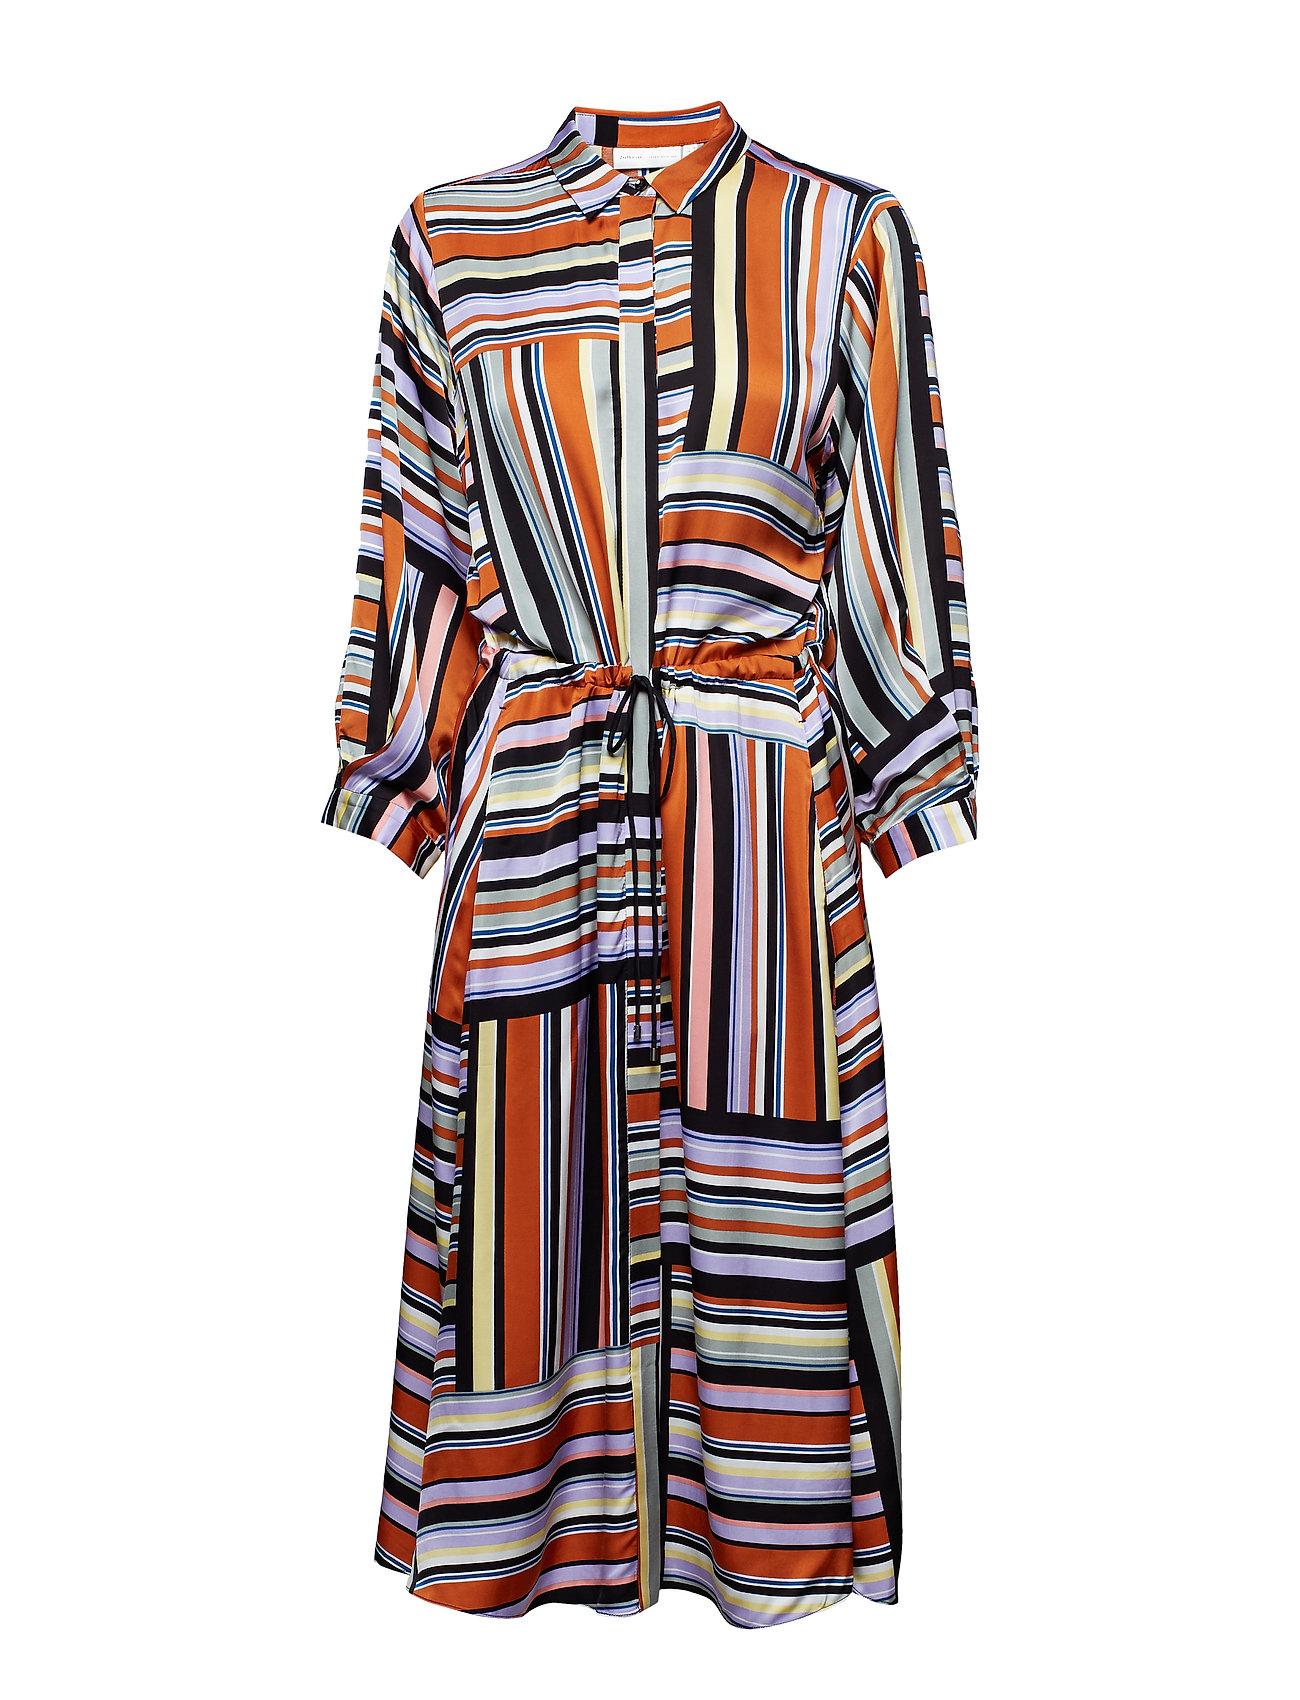 7efe41d24104 Hara Dress (Blocking Stripe) (900 kr) - InWear -